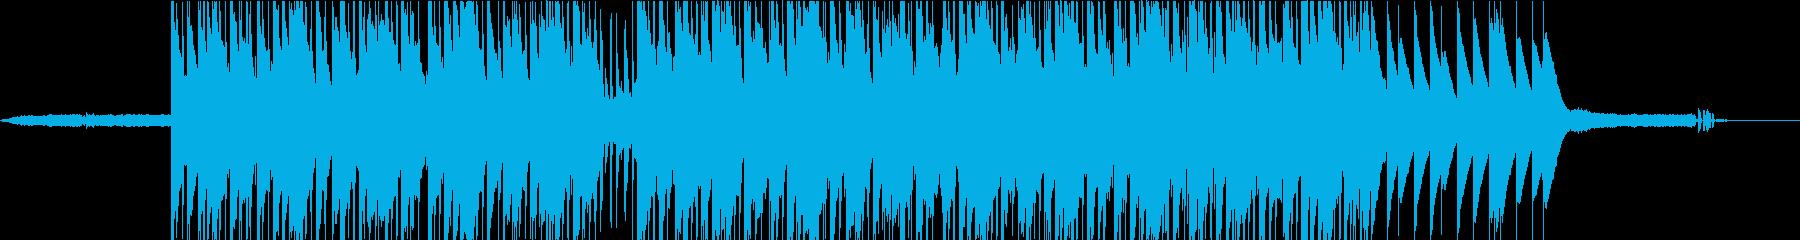 Lo-fiピアノのhiphopの再生済みの波形